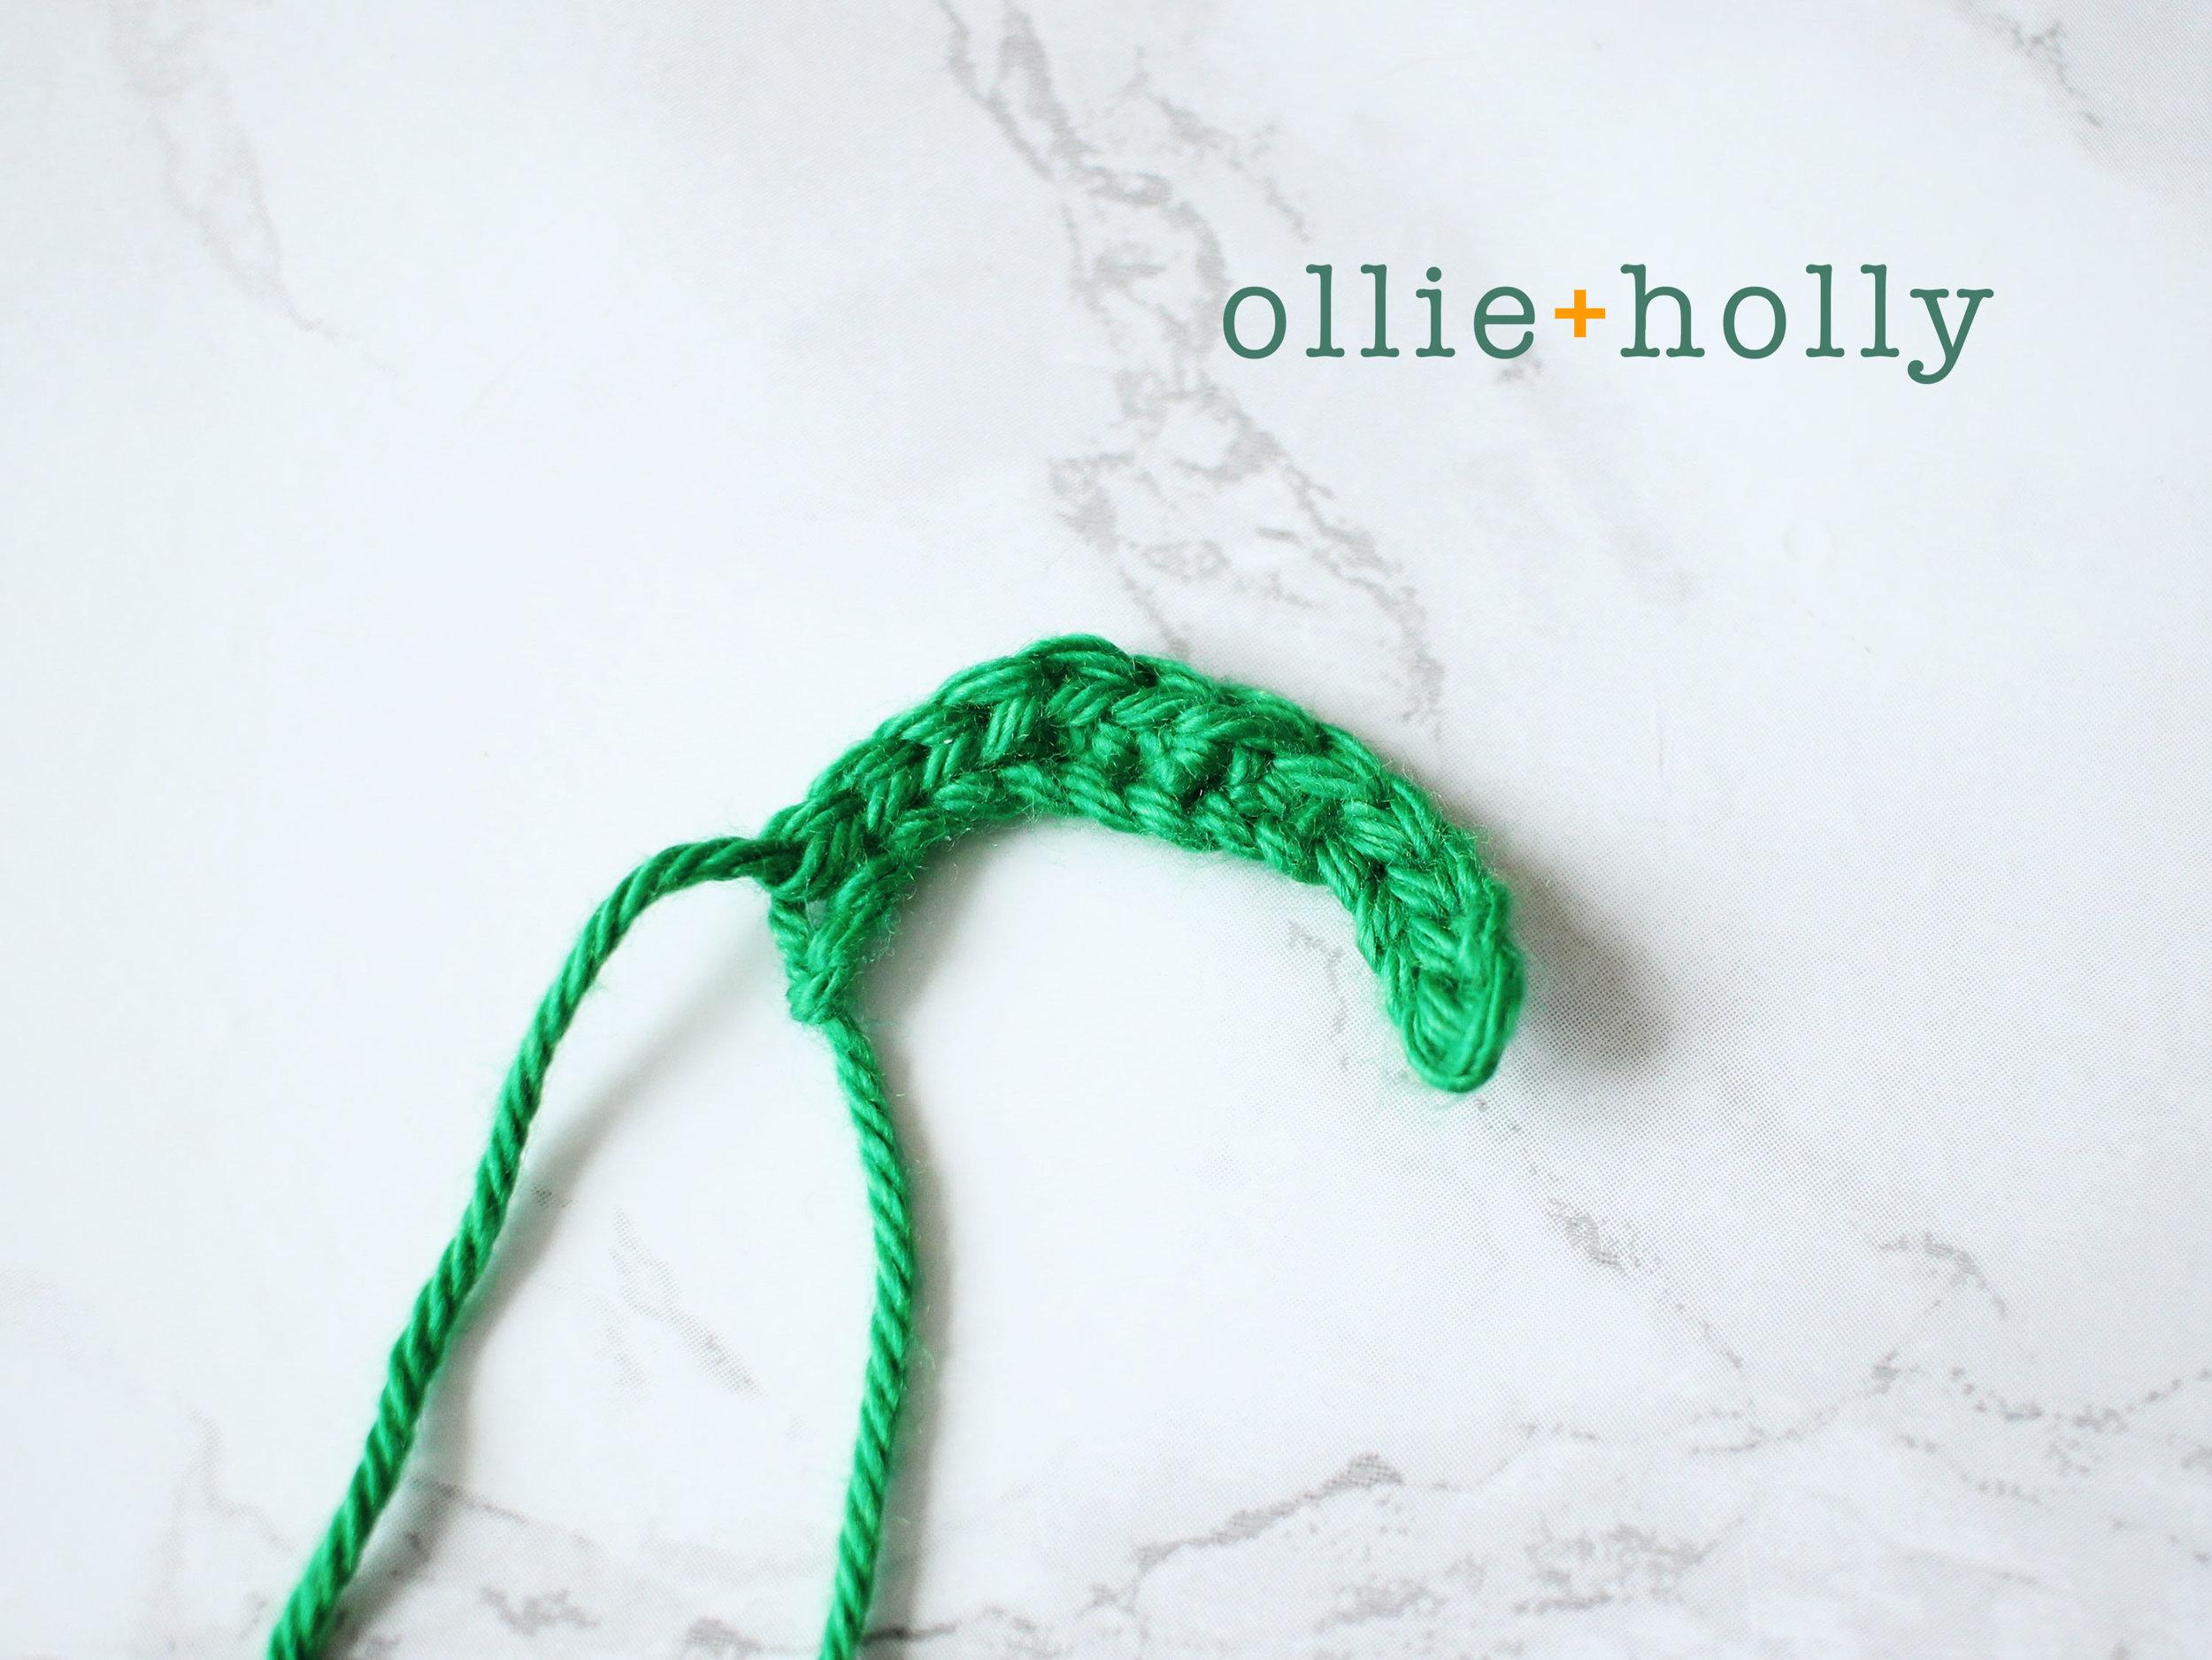 Free Toronto Green Bin Amigurumi Crochet Pattern Step 5